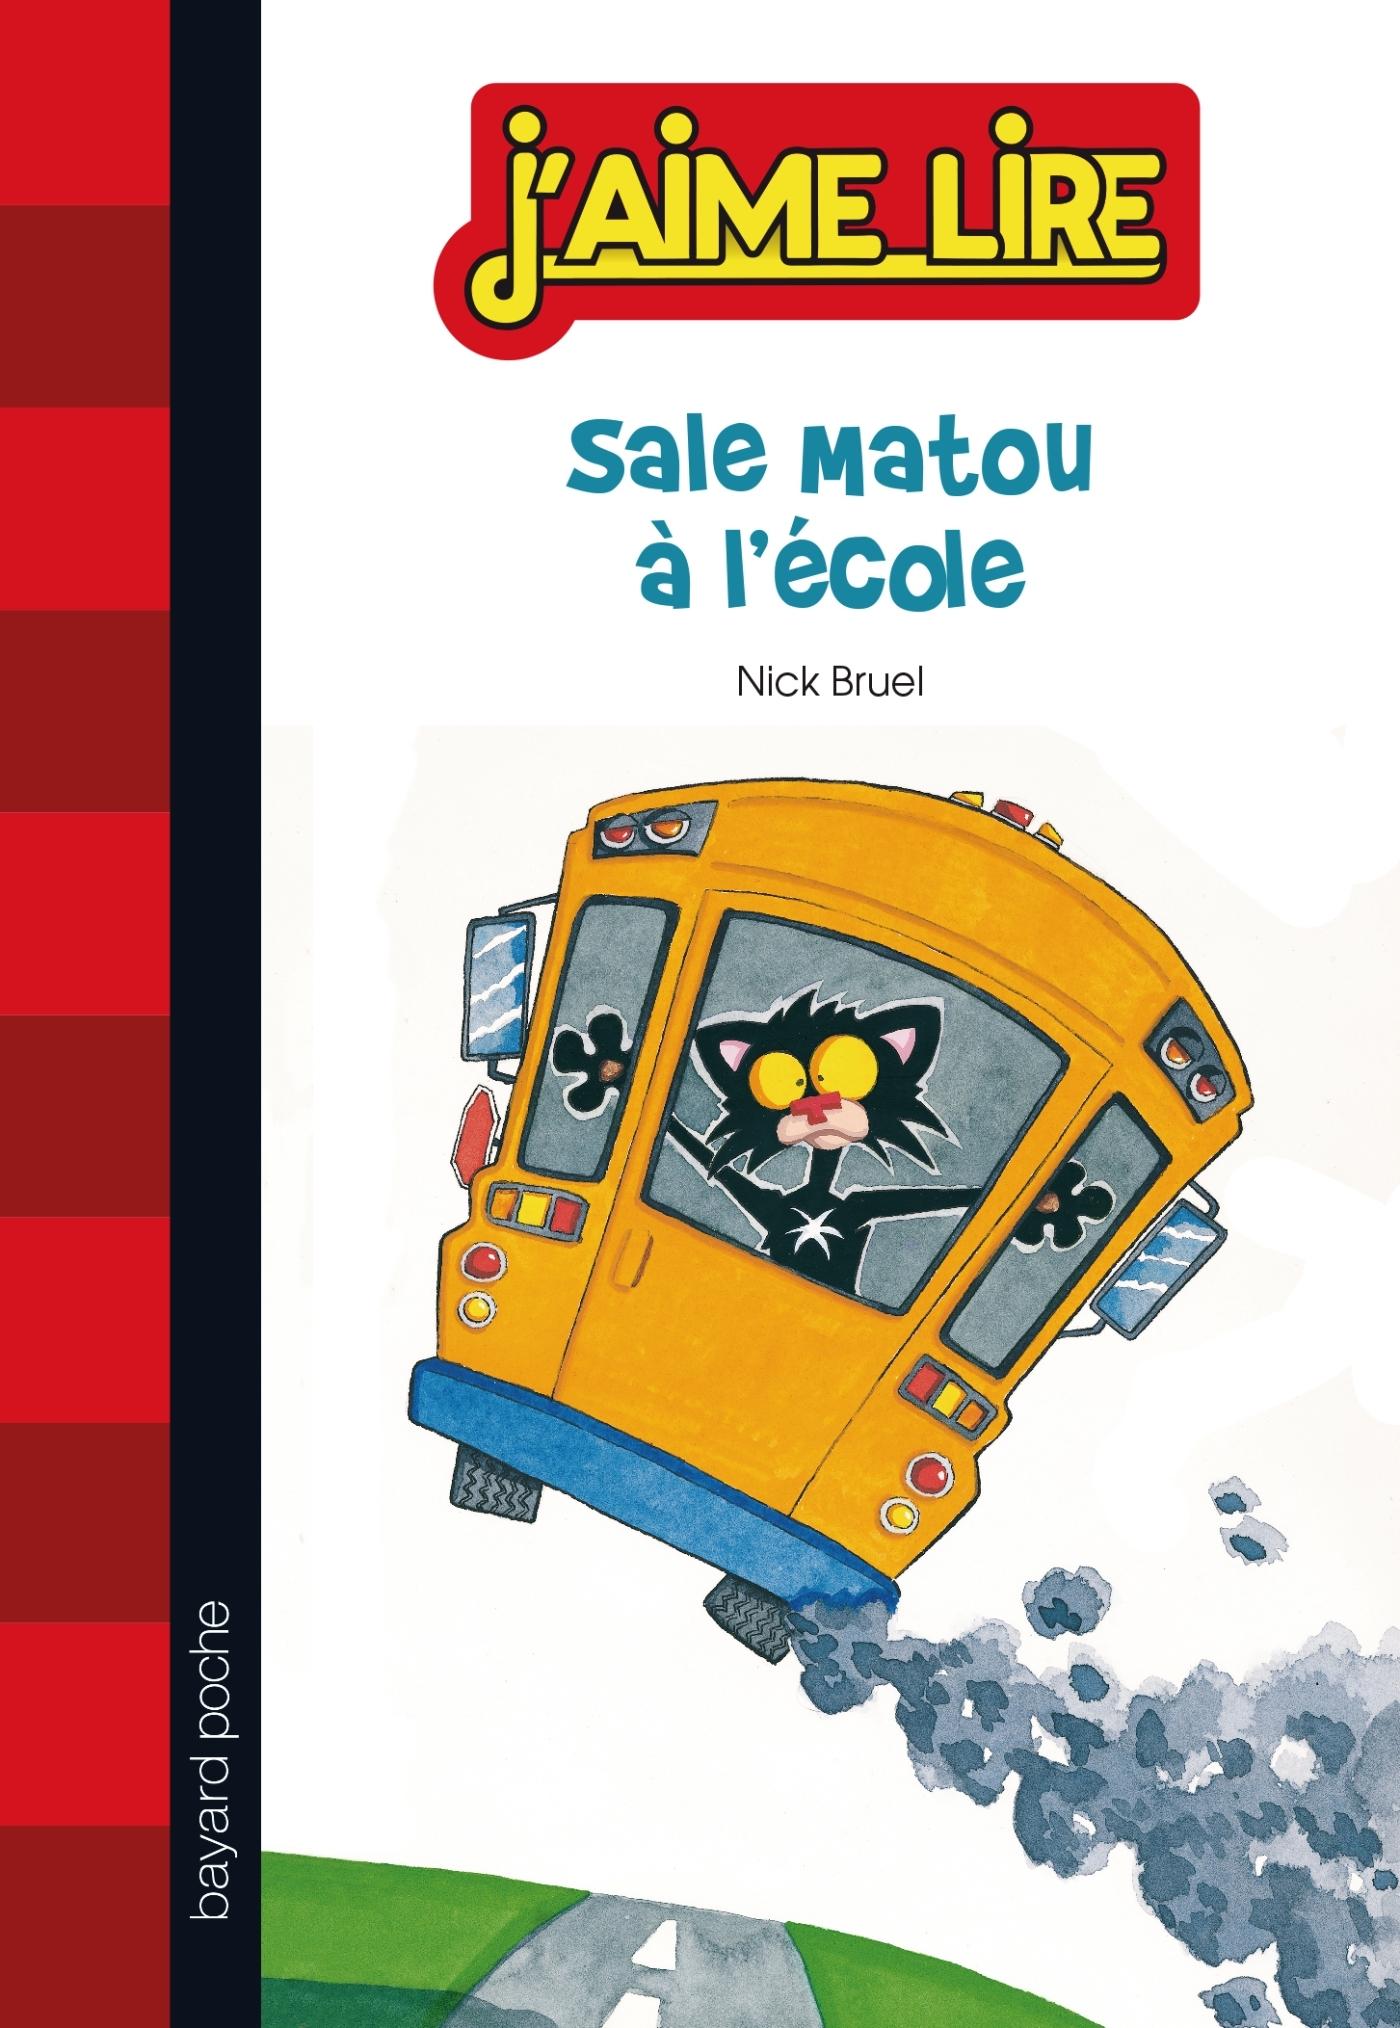 SALE MATOU A L'ECOLE